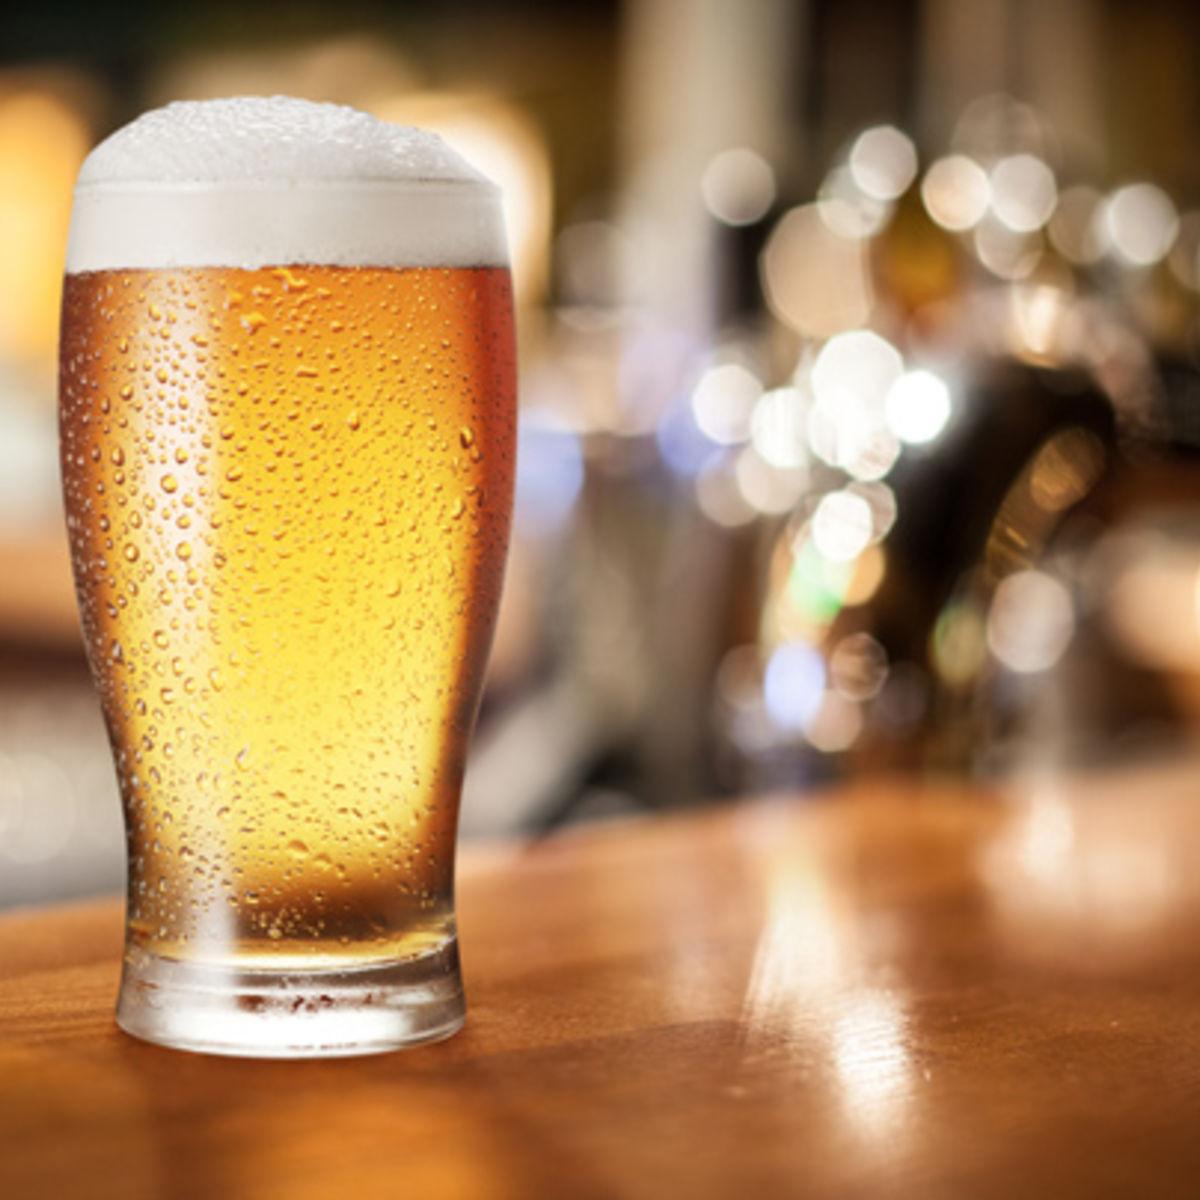 shutterstock_beer_glass_0.jpg